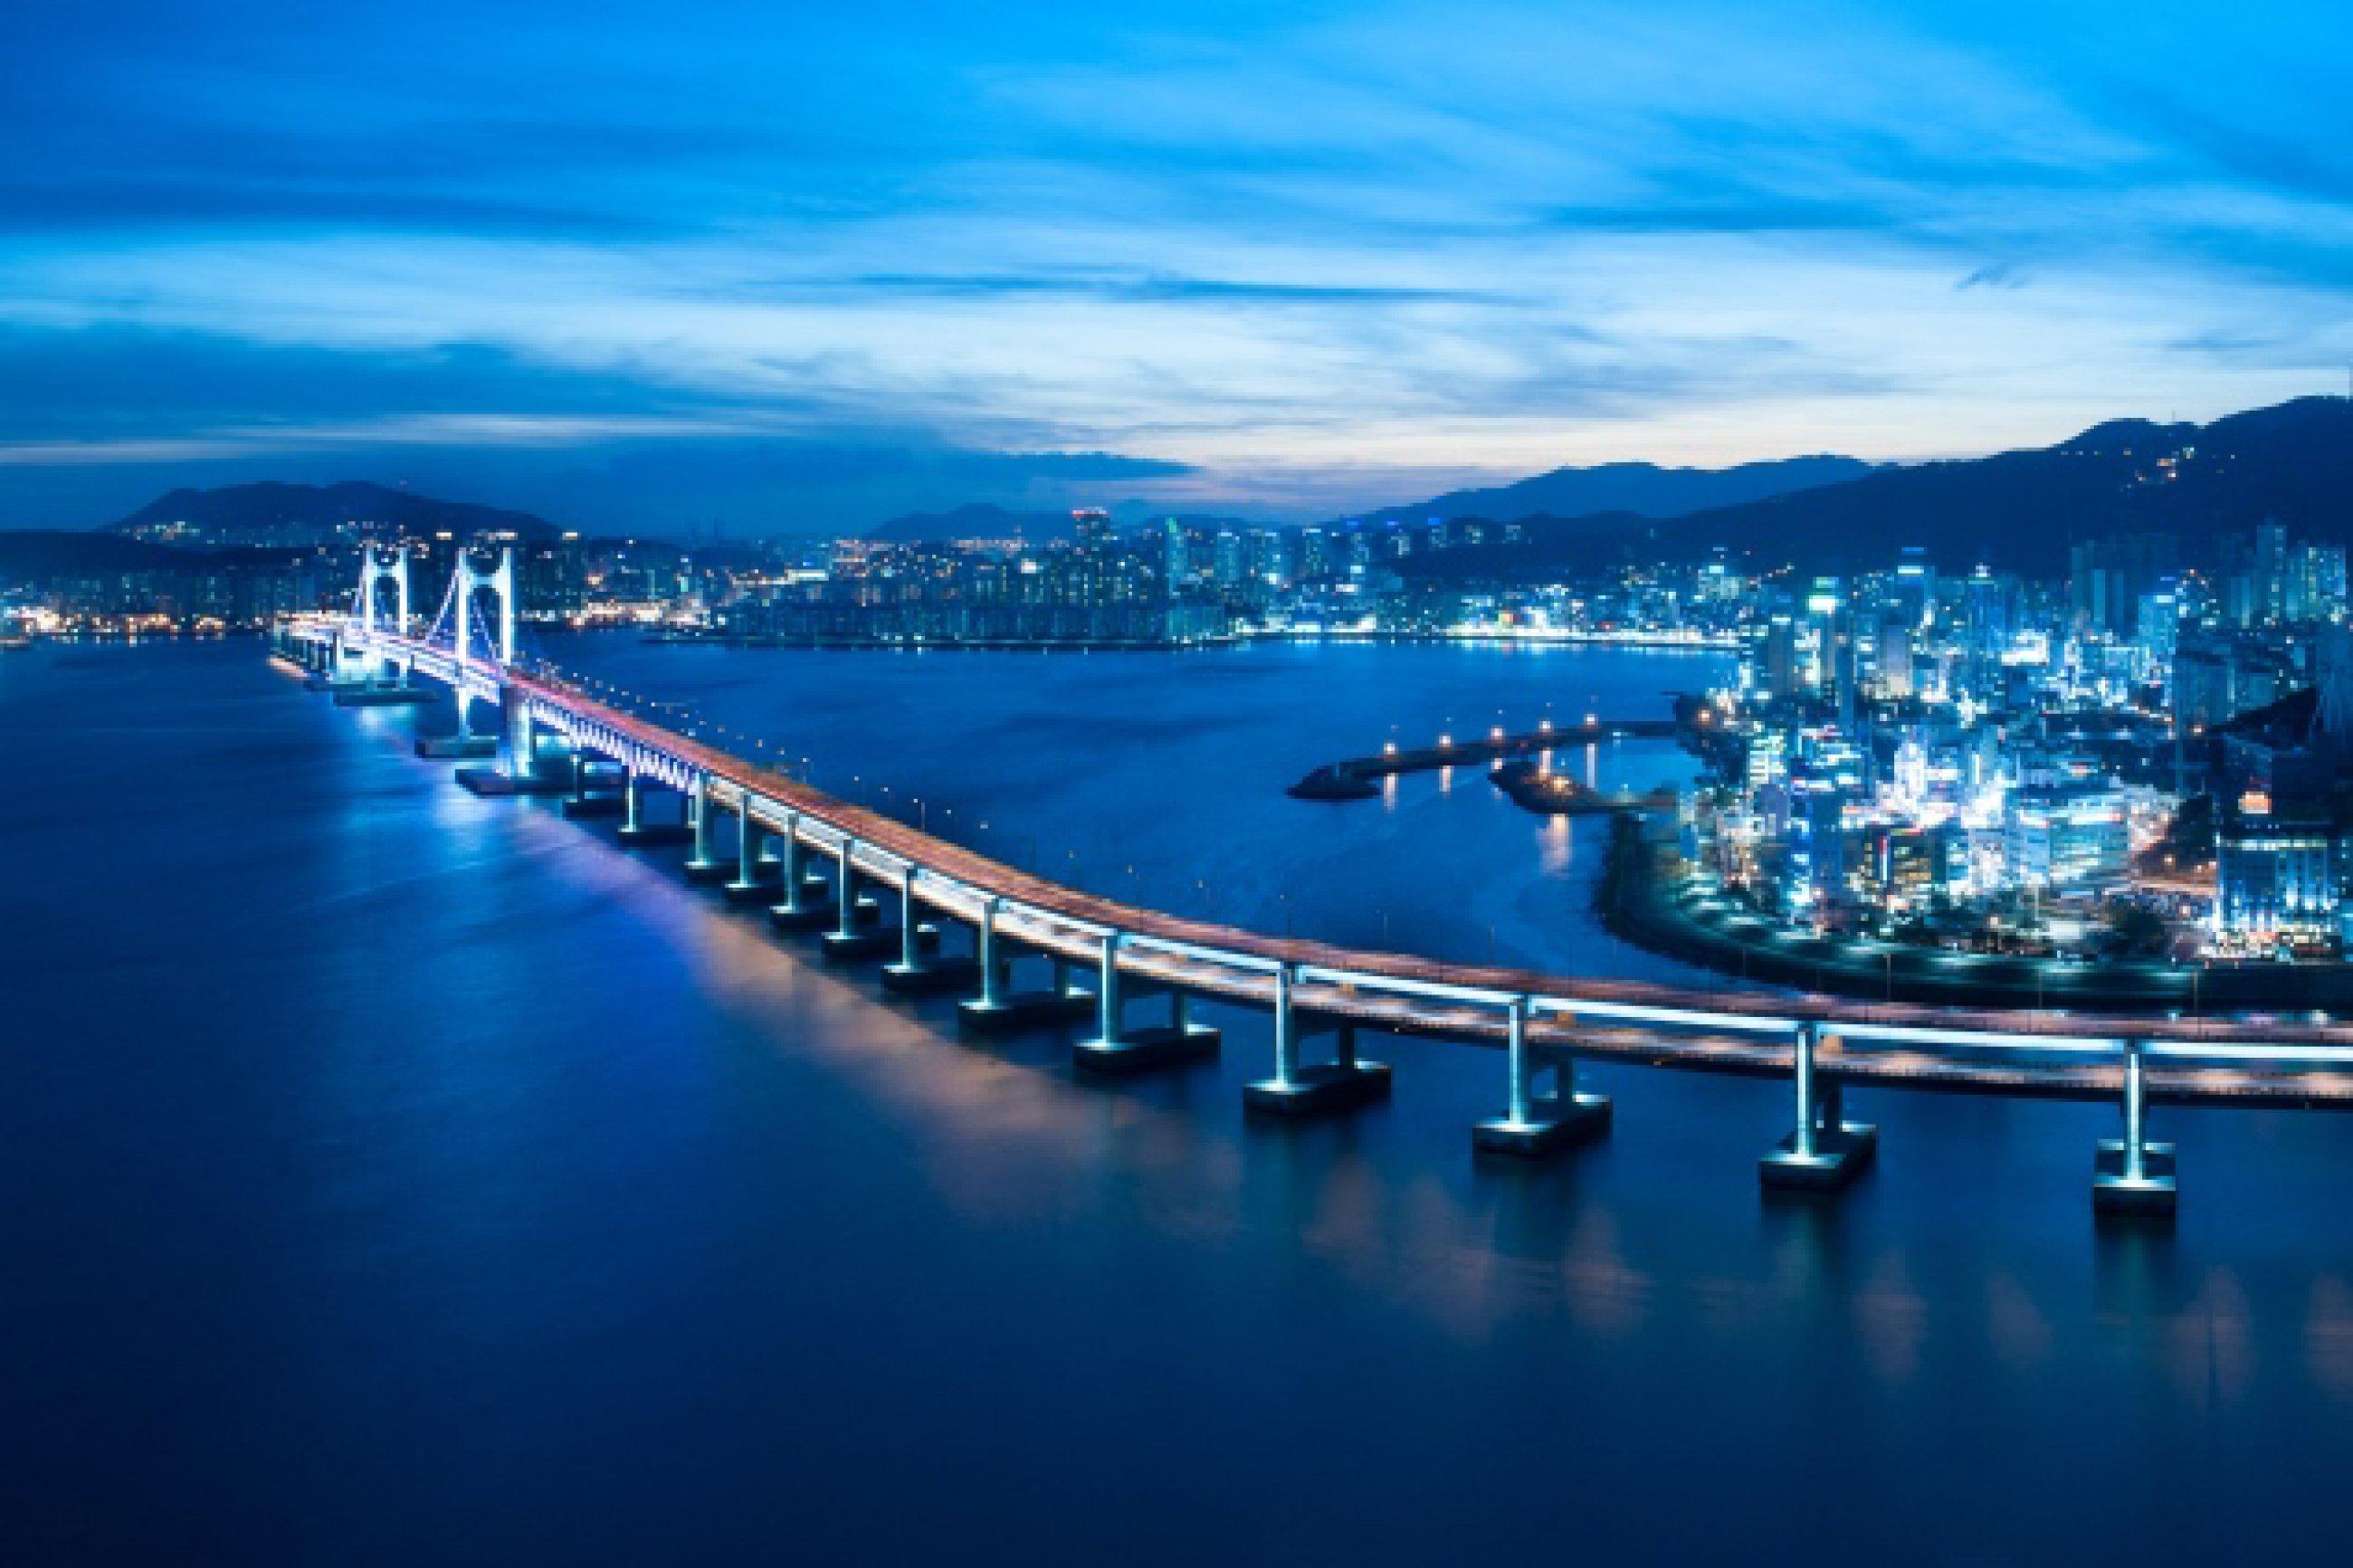 https://bubo.sk/uploads/galleries/7452/looking-over-busan-diamond-bridge-from-top-of-a-building.jpg